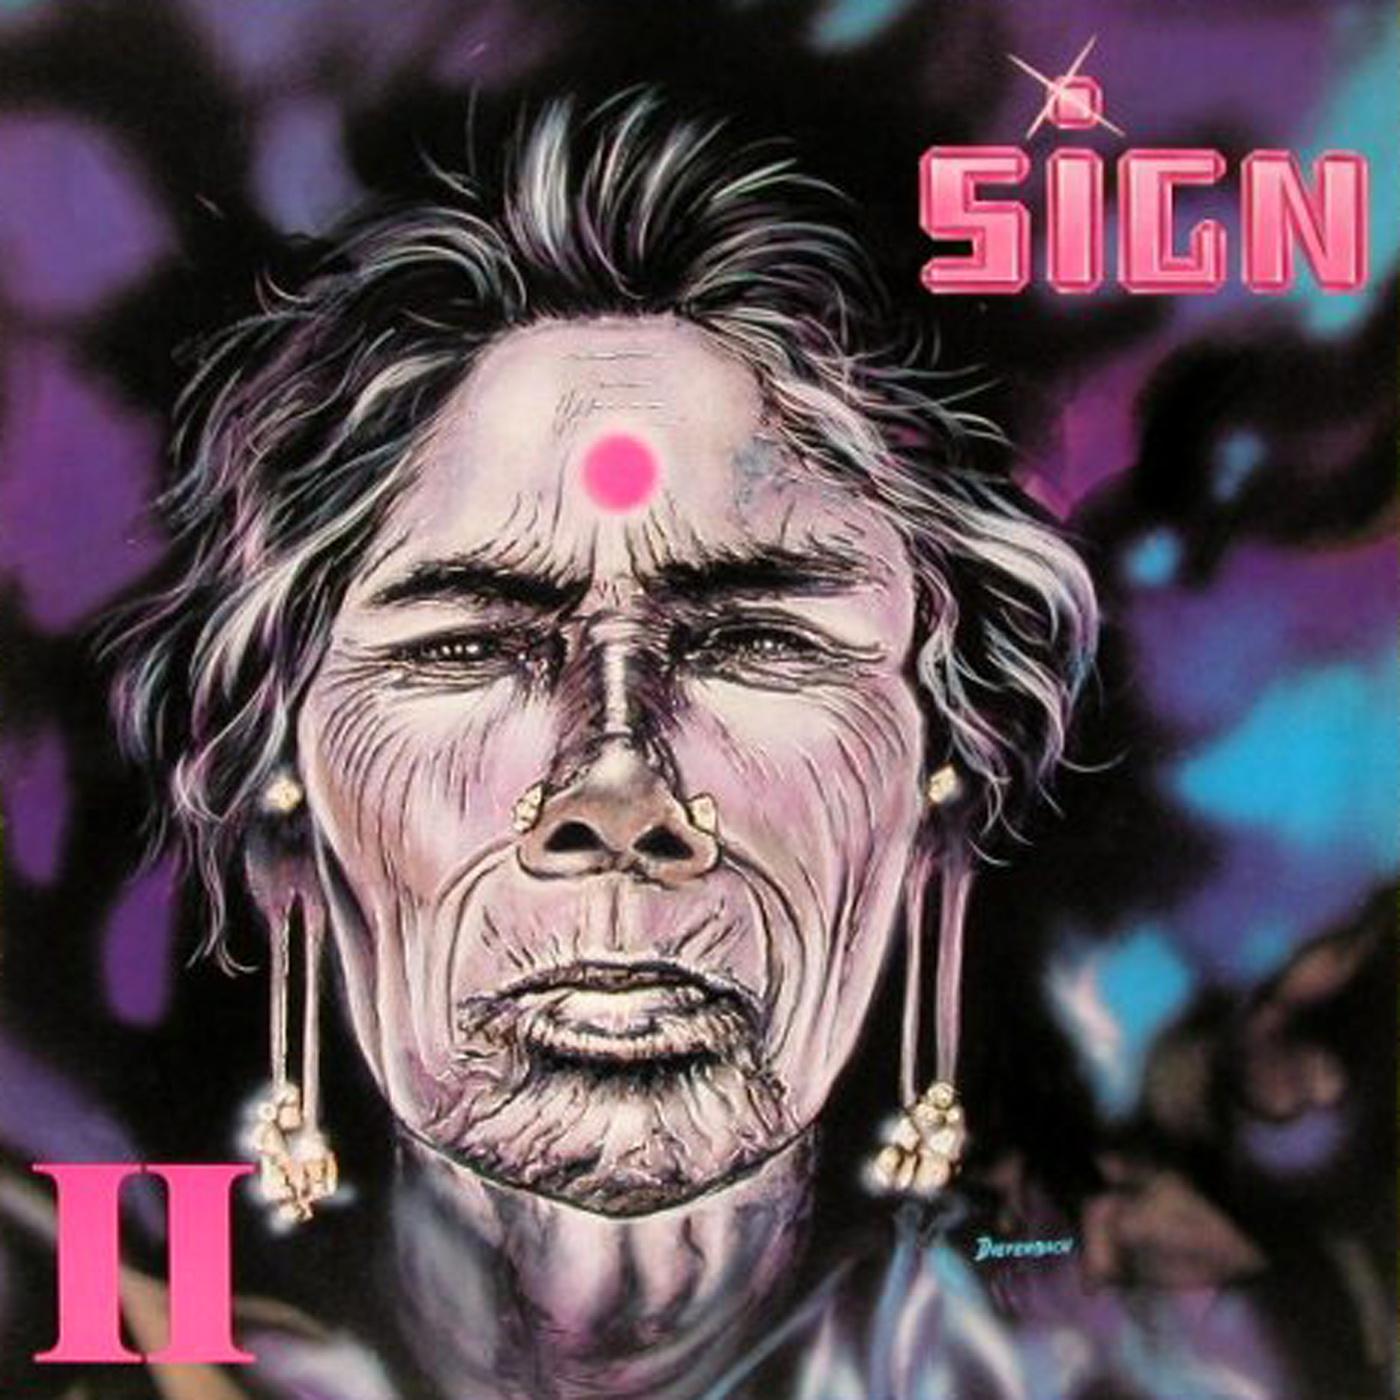 http://1.bp.blogspot.com/_7WL8YT7JOT0/S8RDQQYpIDI/AAAAAAAAHpg/GtDJNd4FNmw/s1600/Sign+-+II+-+Front.jpg